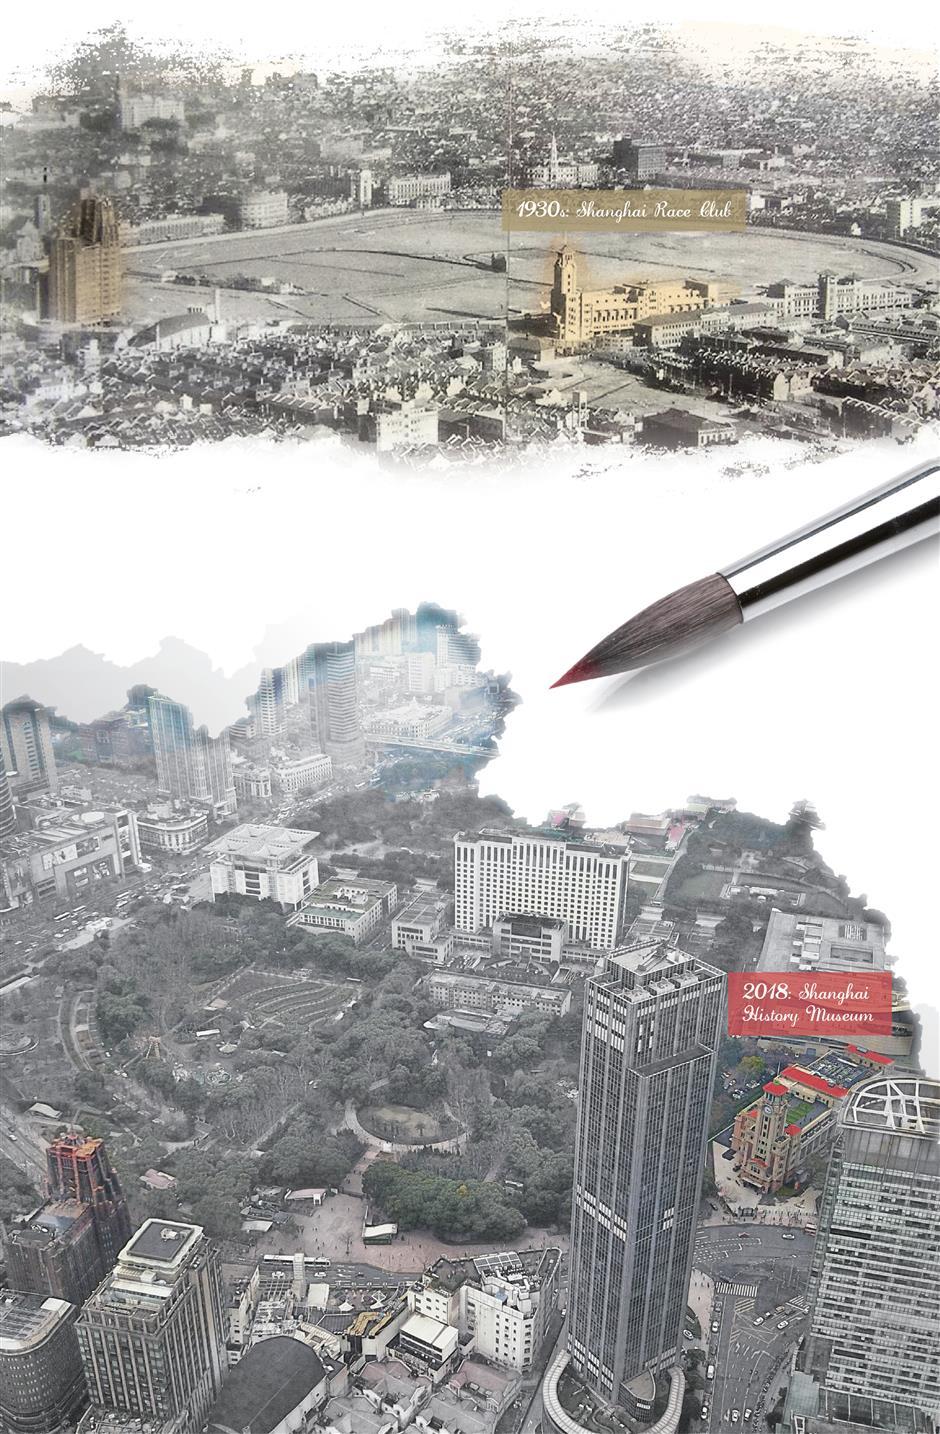 Surviving the regeneration of Nanjing Road